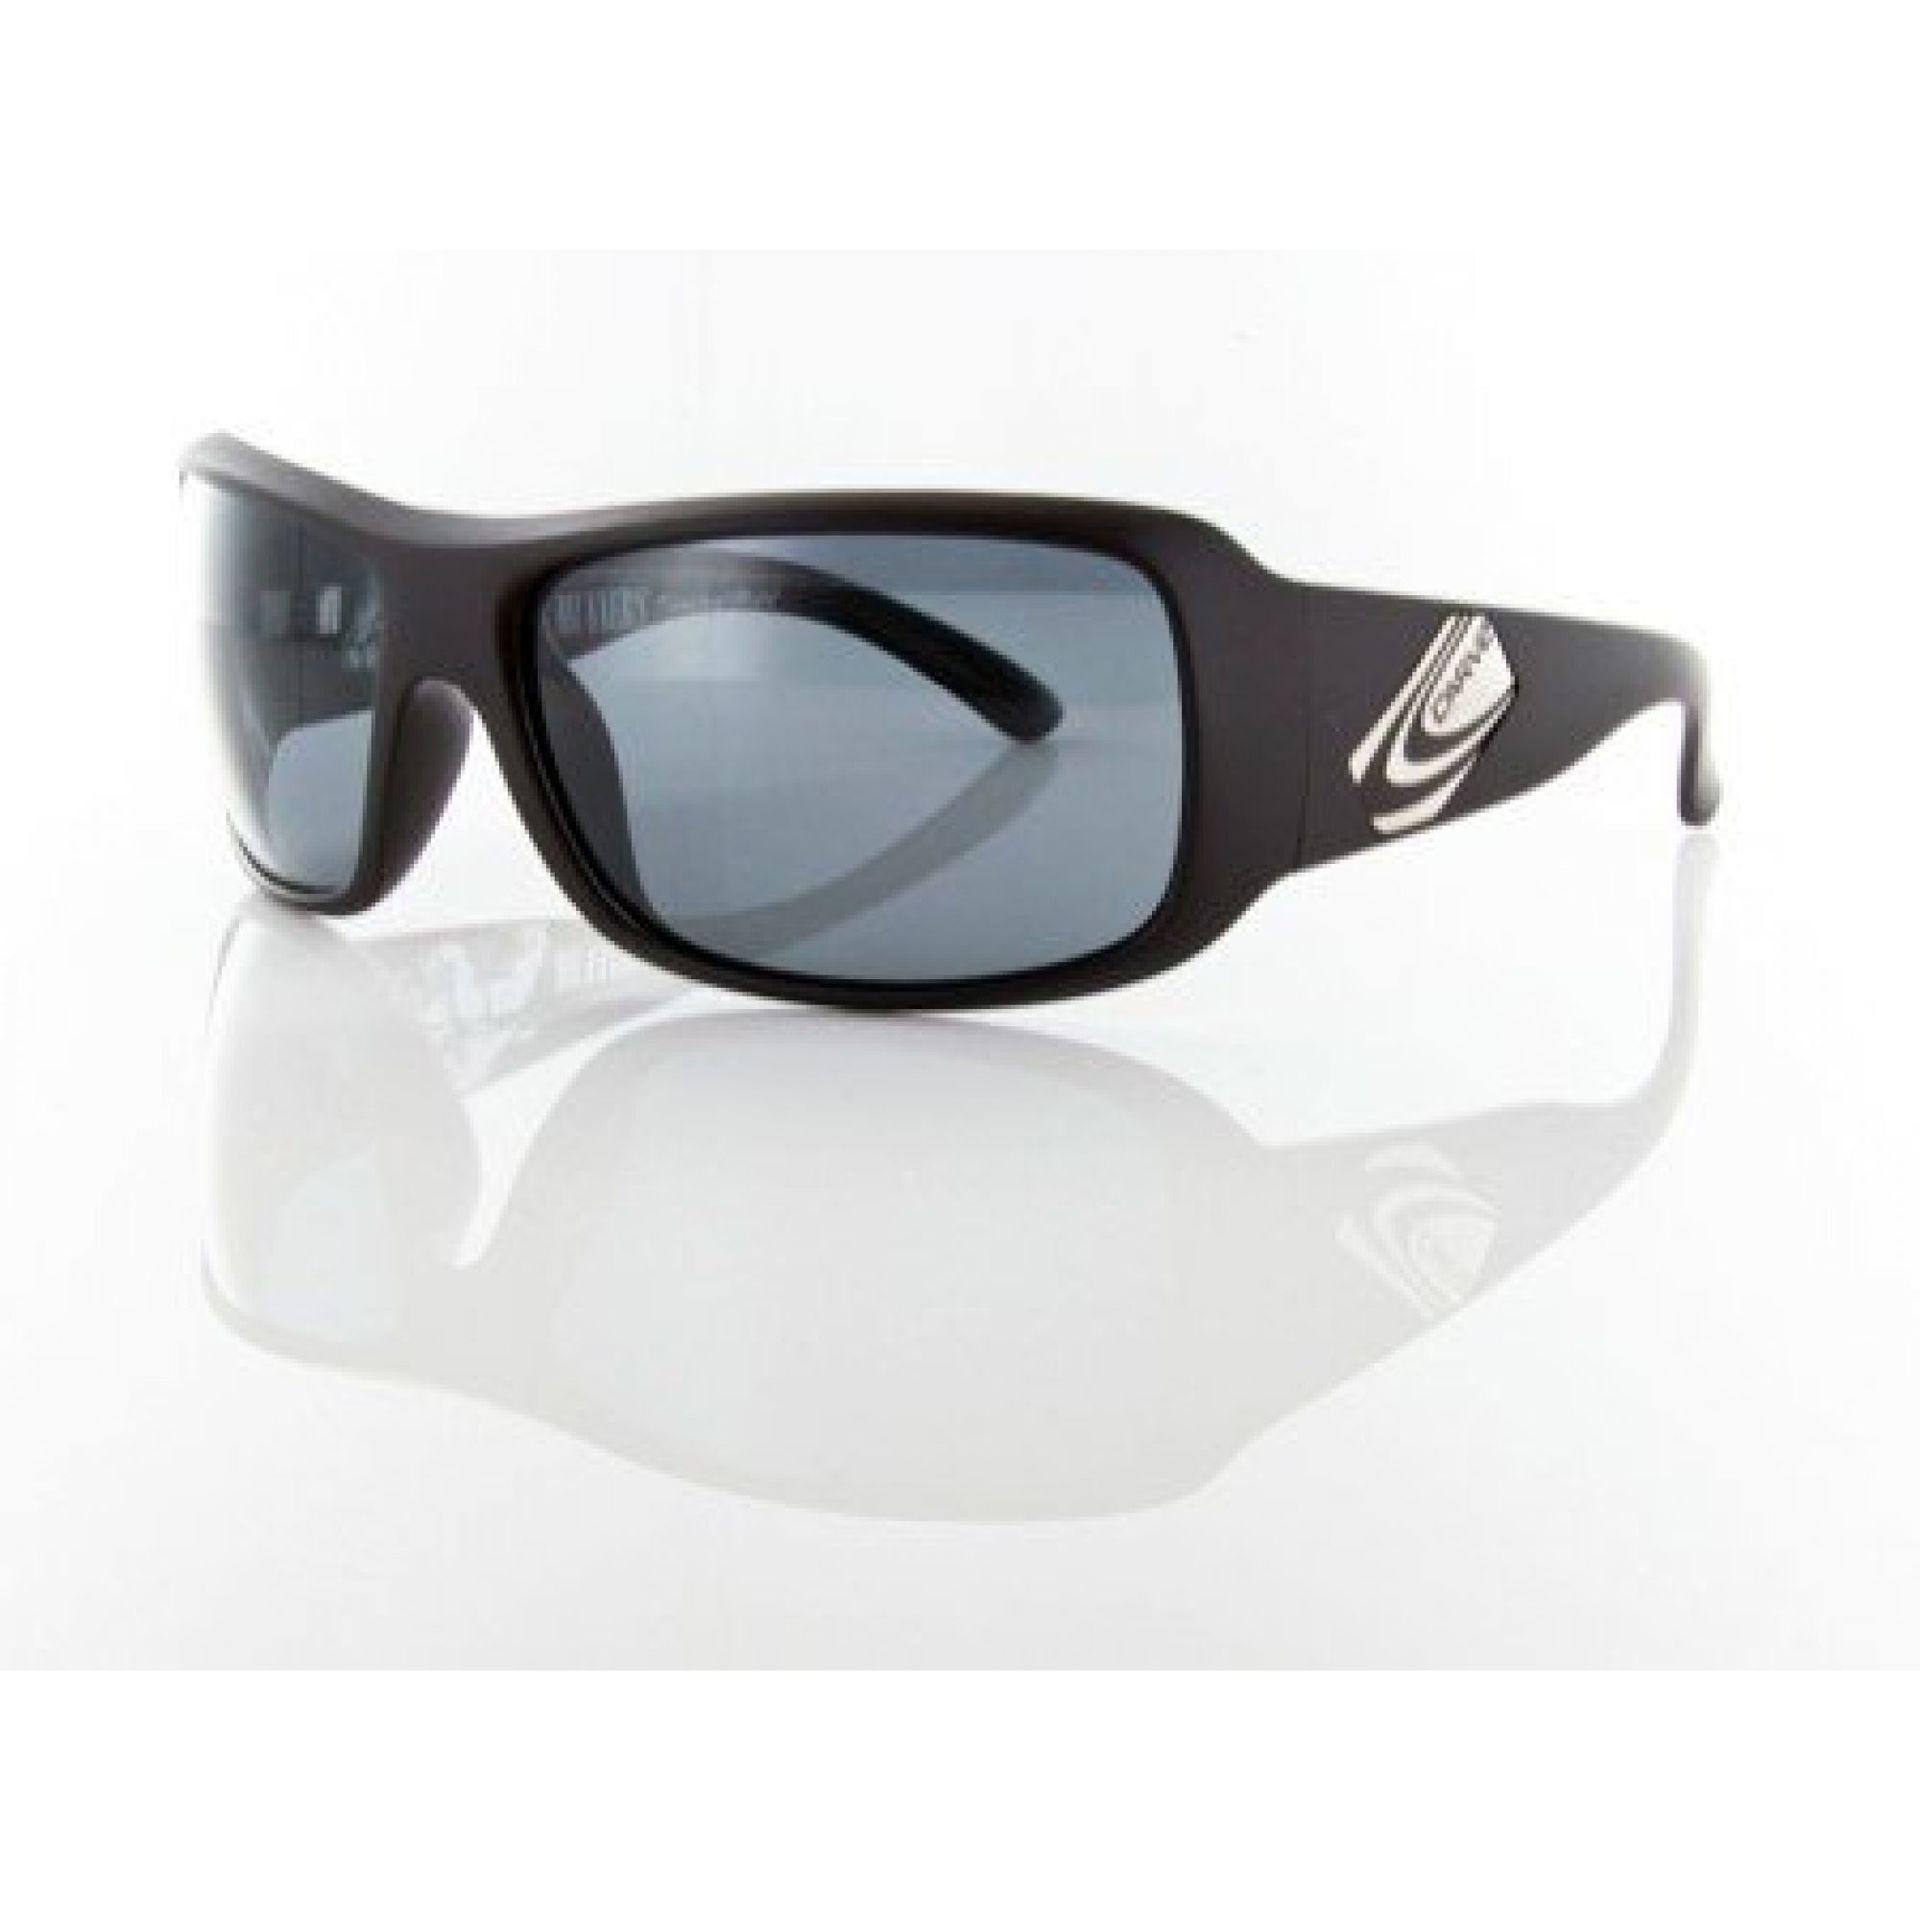 Okulary Carve Trent Munro czarne